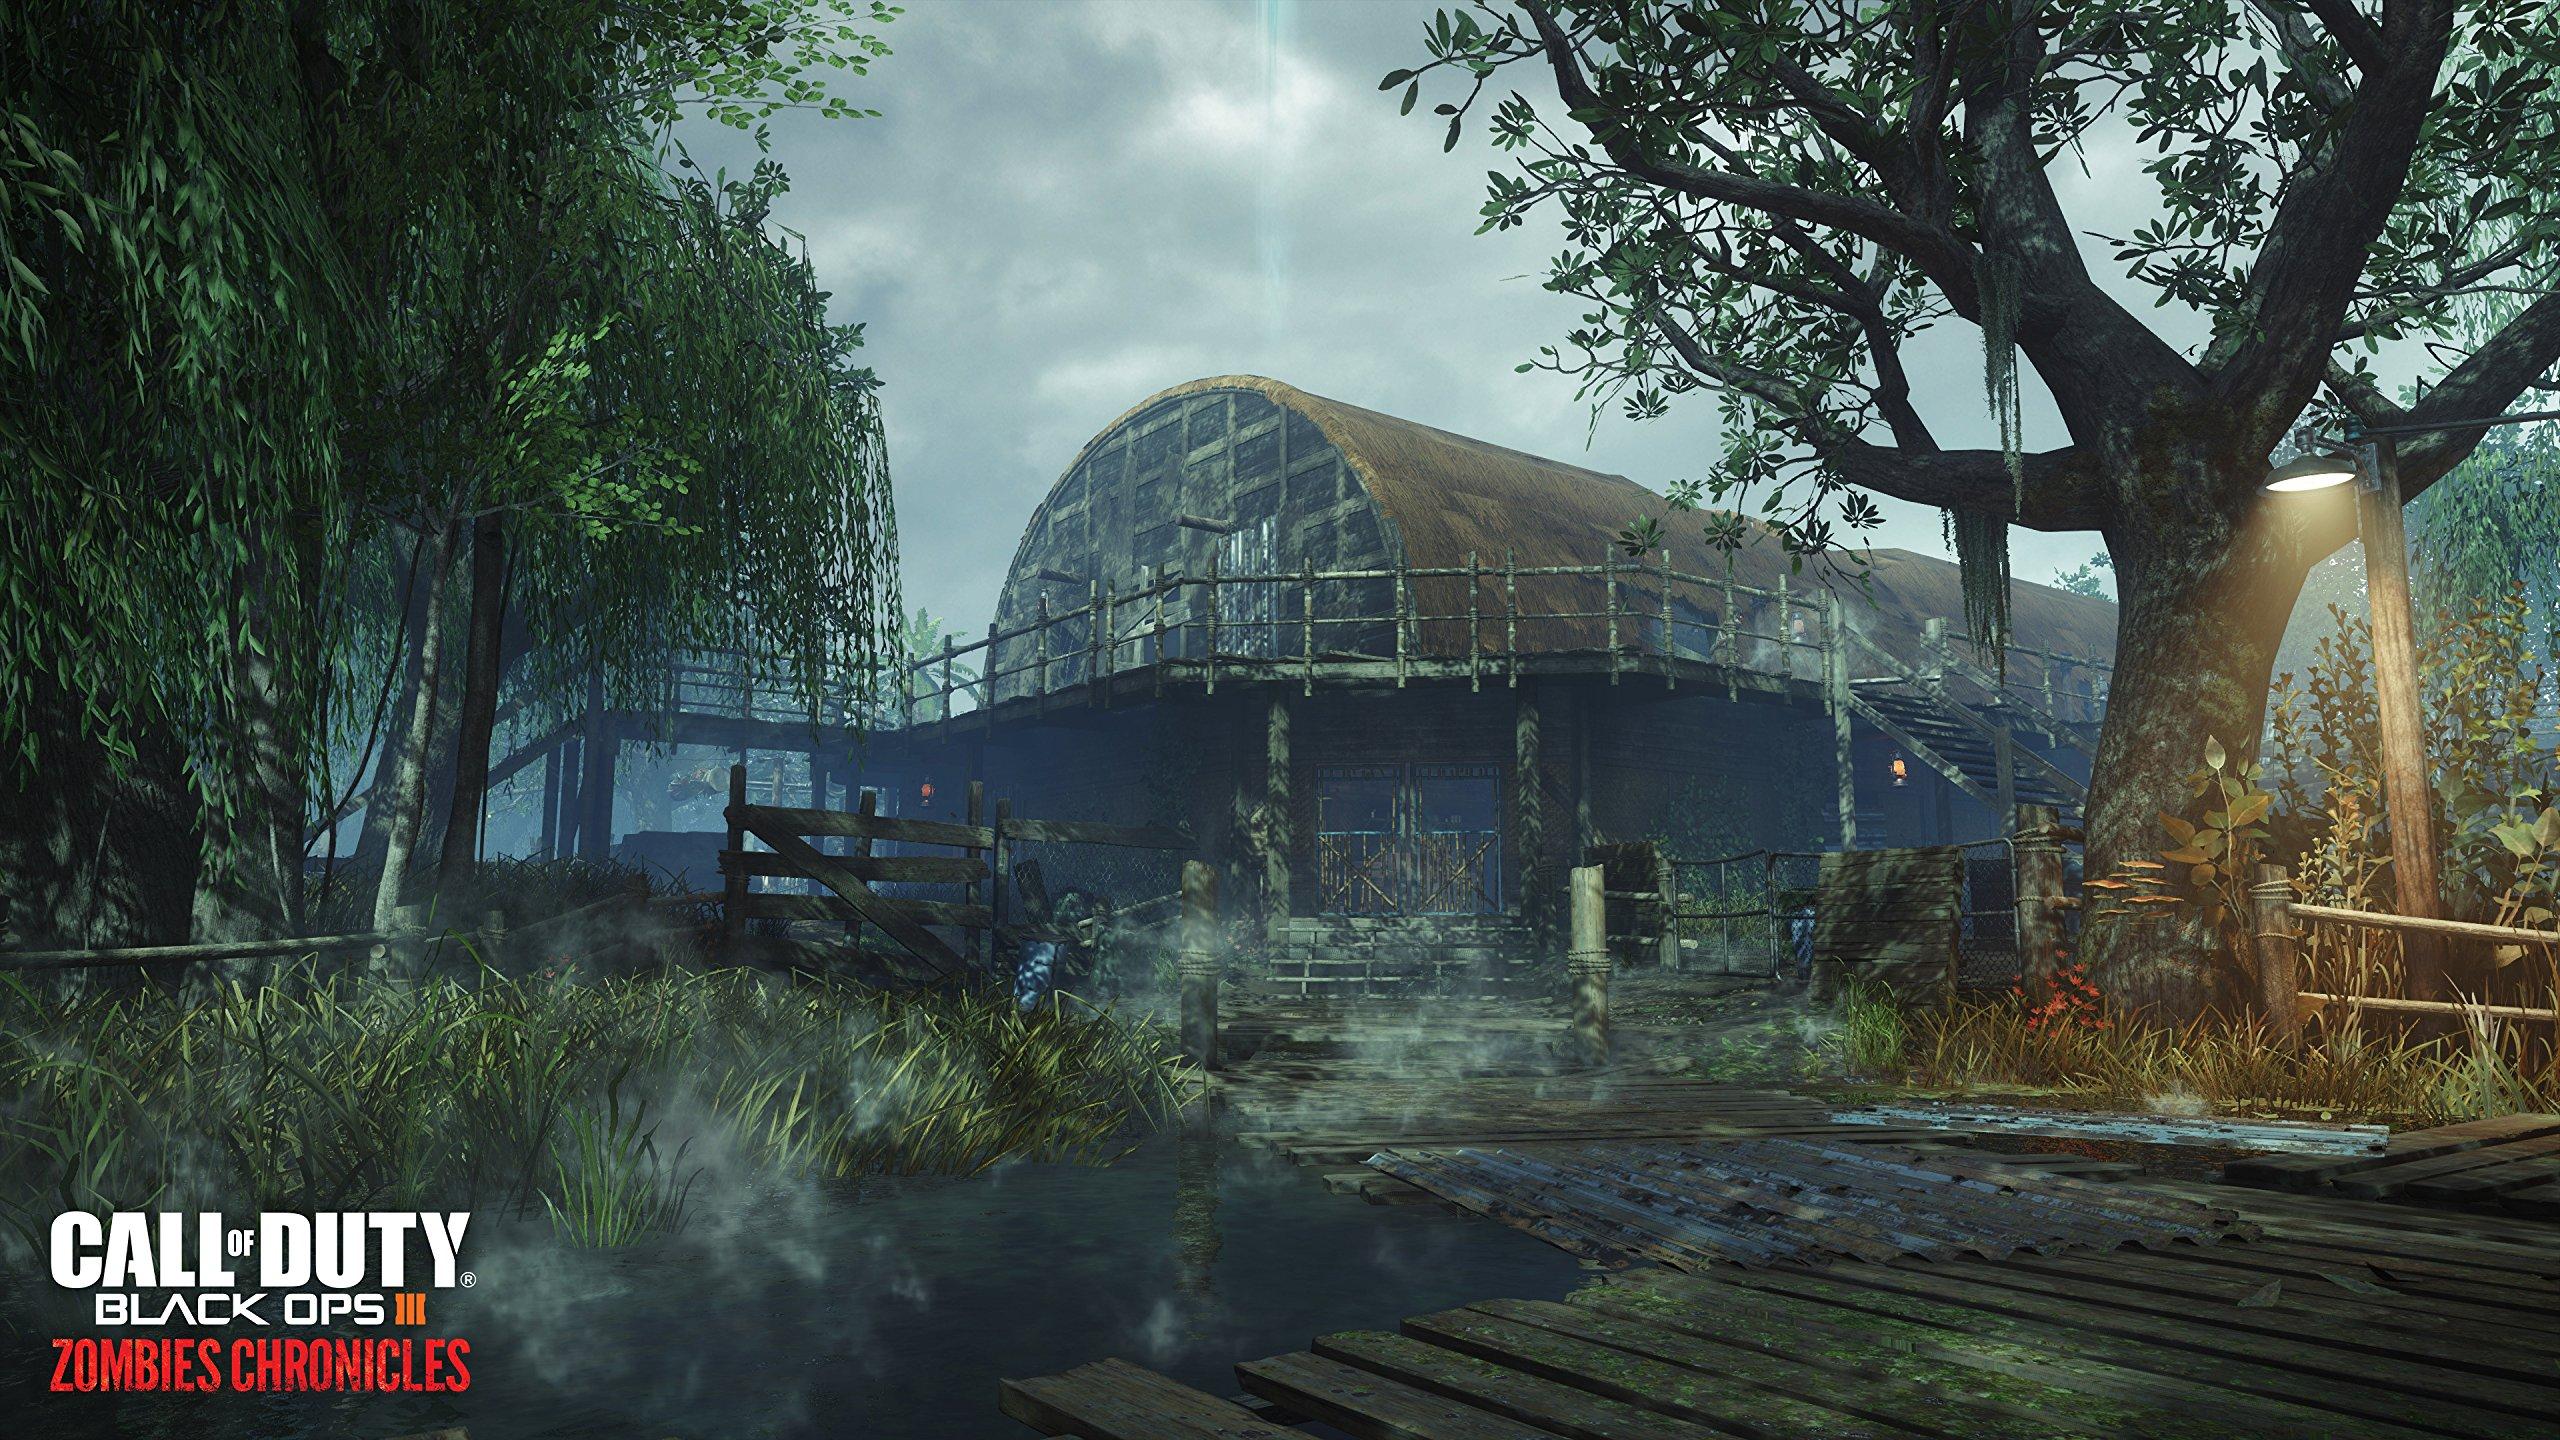 Call Of Duty Black Ops III - Zombies Chronicles: Amazon.es: Videojuegos